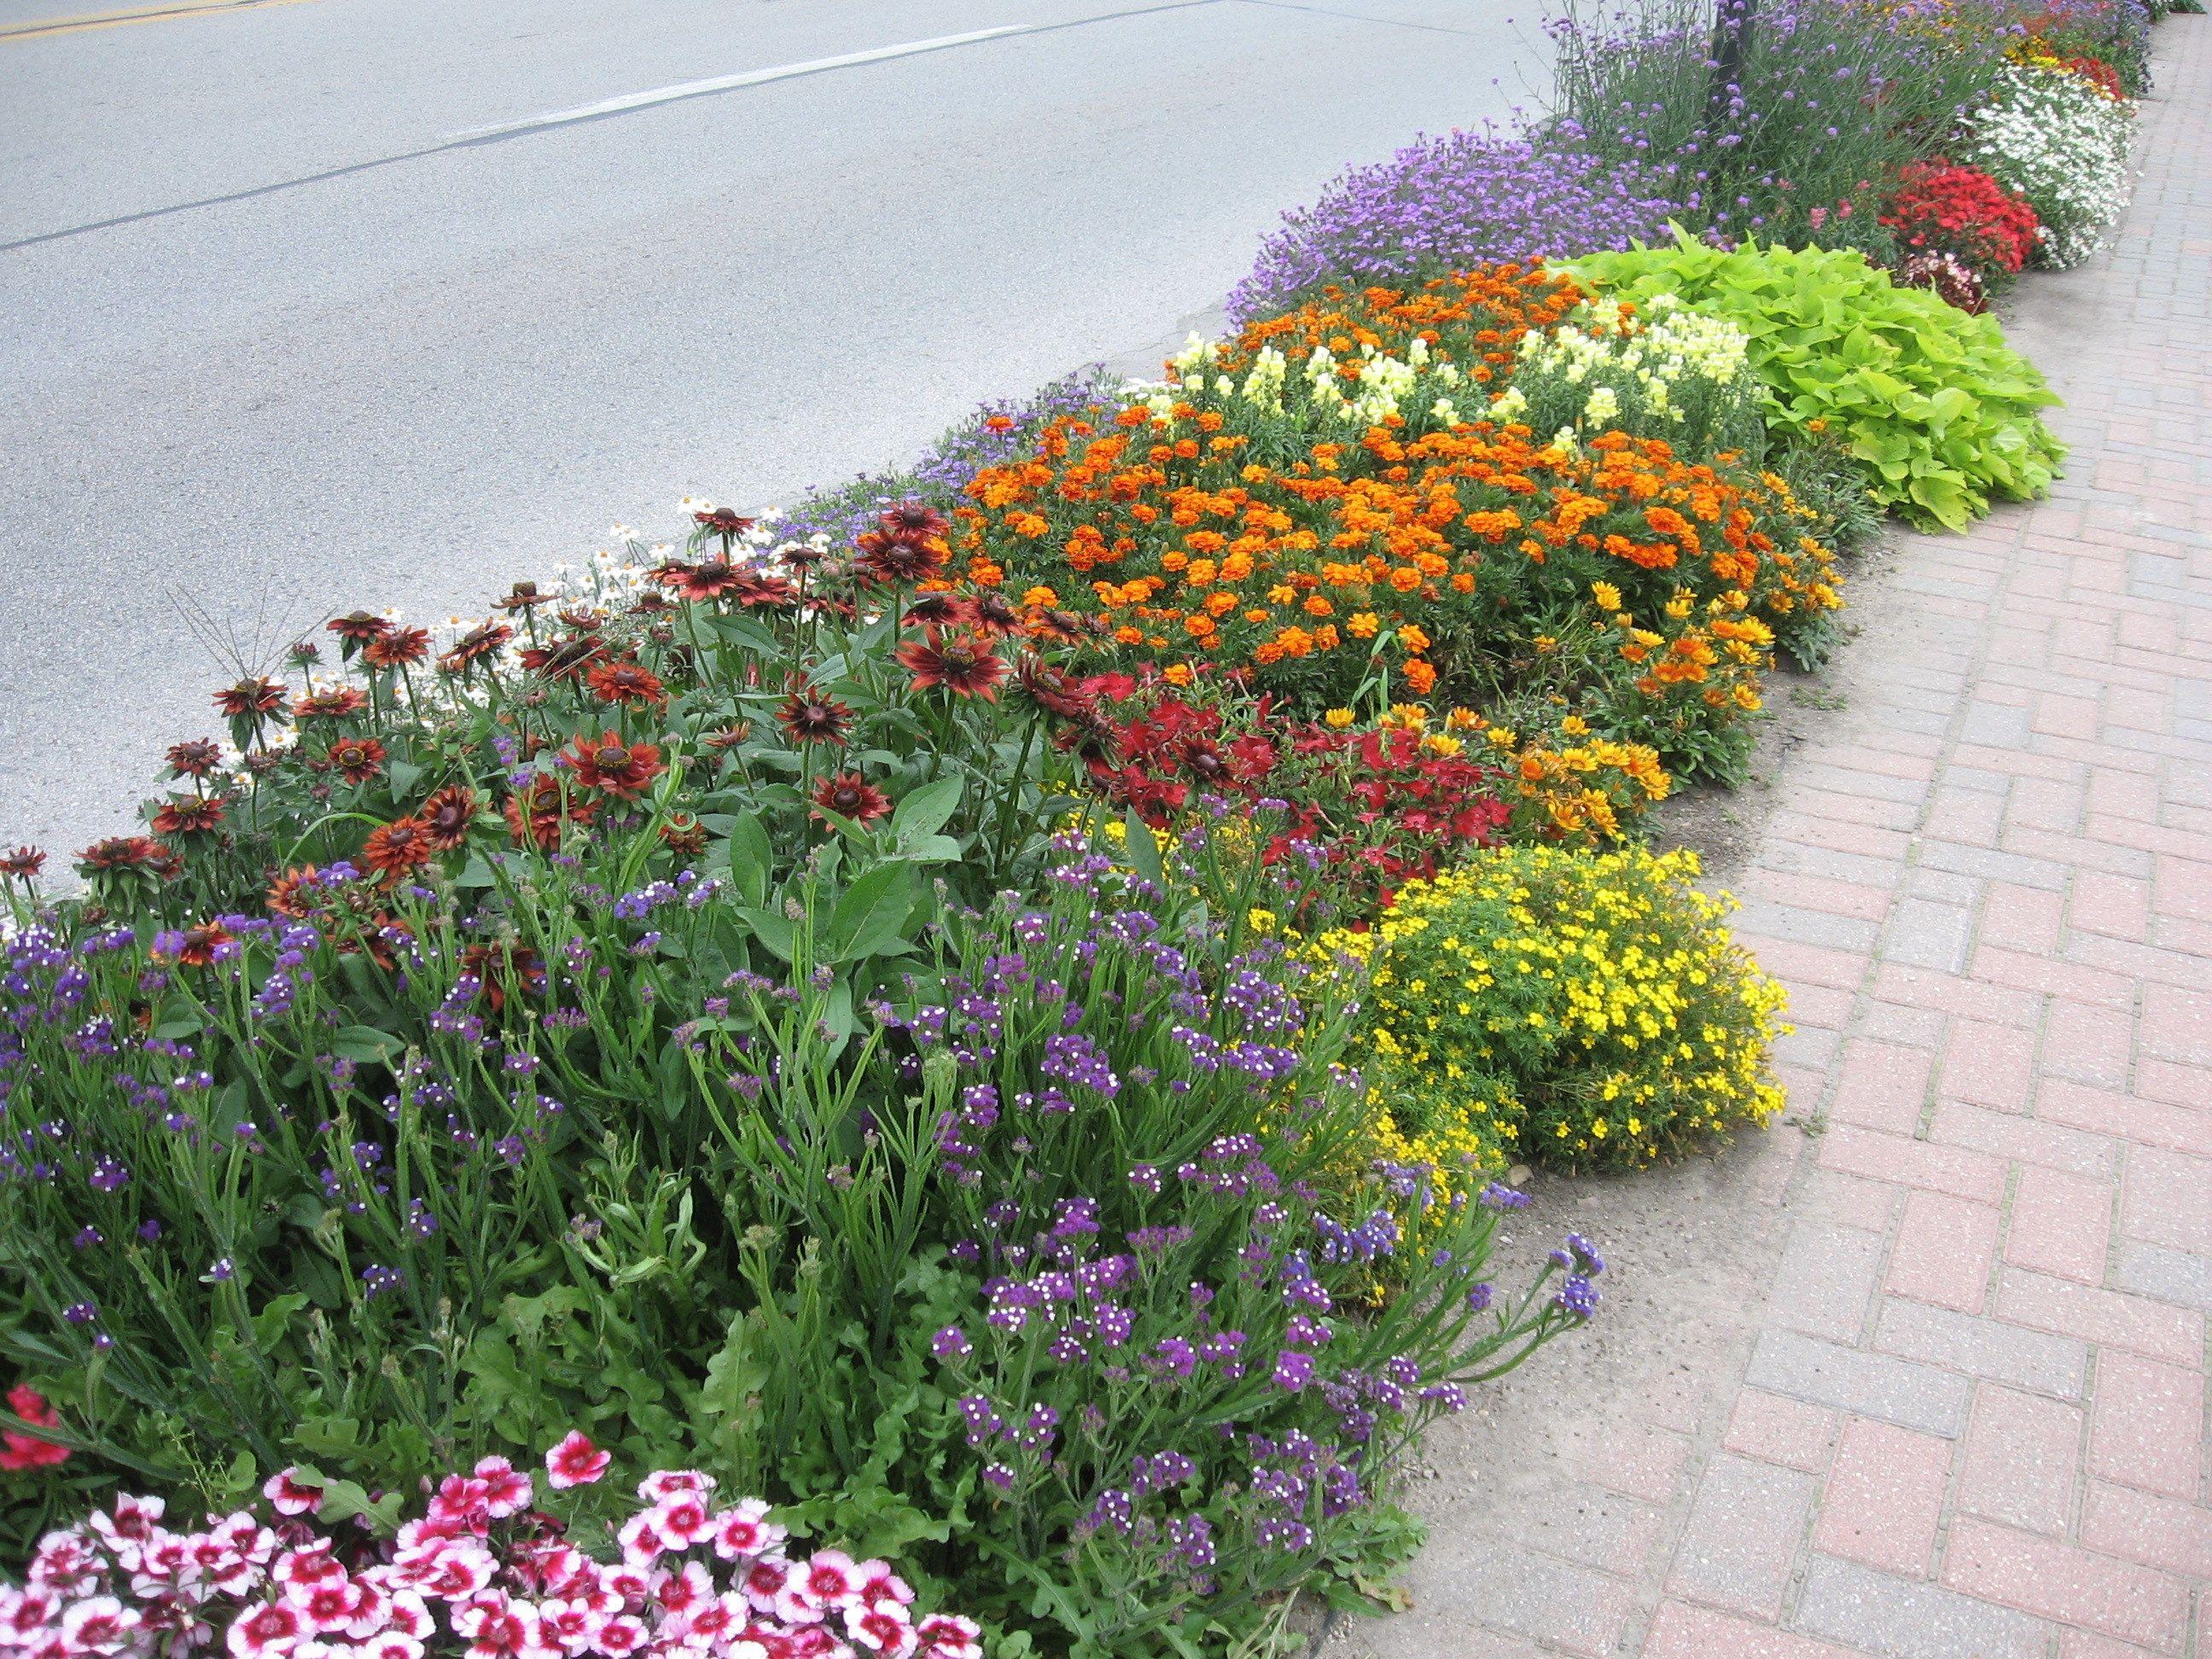 Curb Side Hellstrip Garden With Calendula Marigold Sweet Potato Vine Iris Dianthus Salvia And Sedum Sidewalk Landscaping Garden Vines Marigolds In Garden